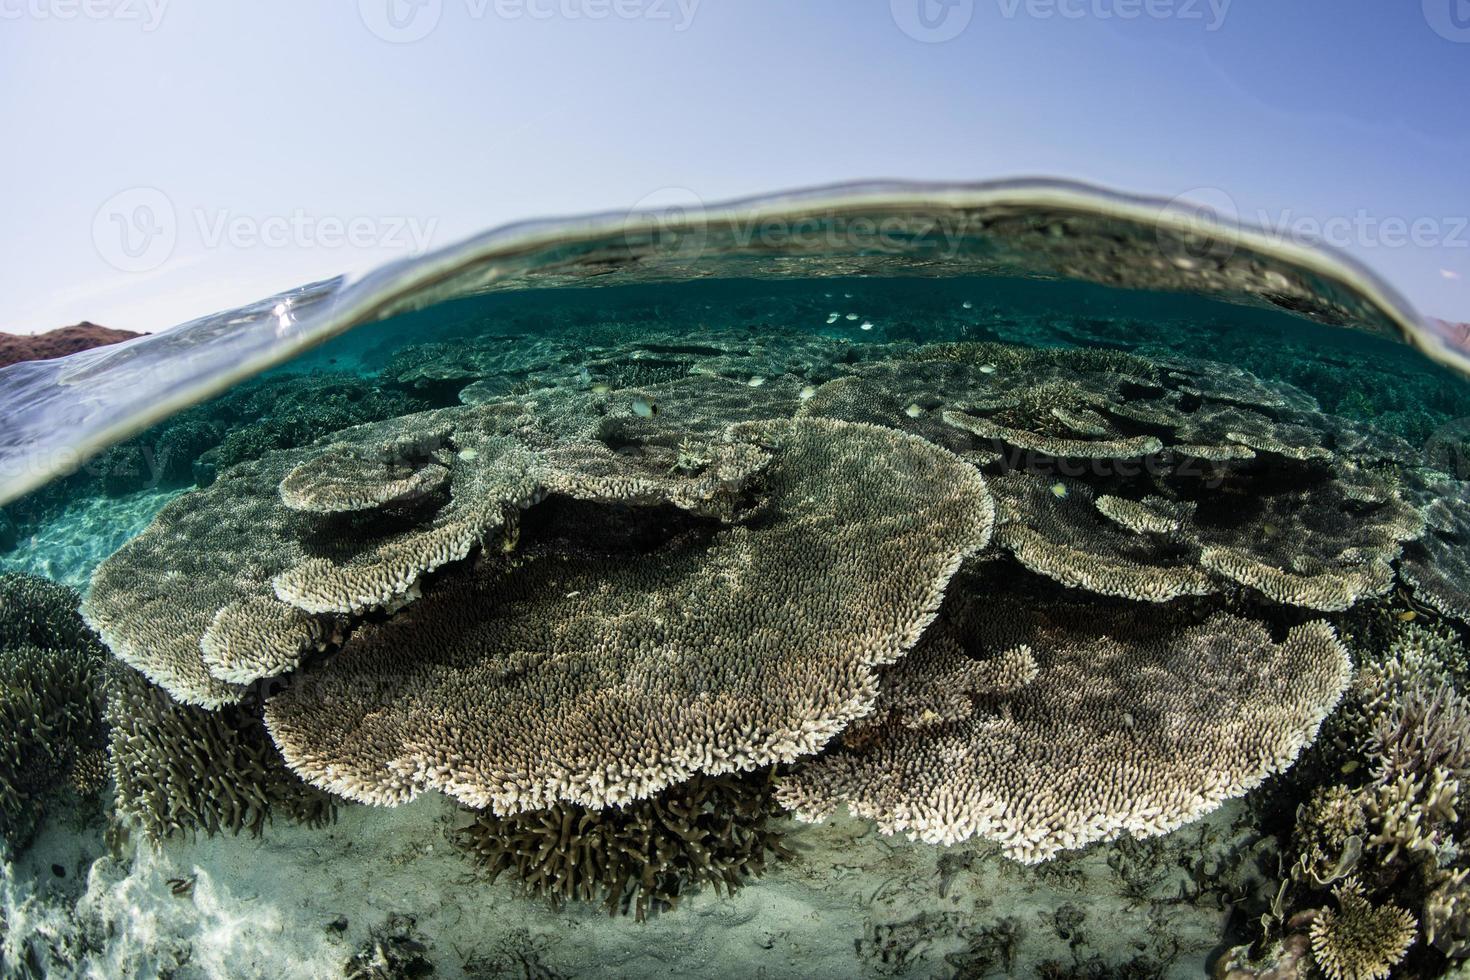 bella barriera corallina in Indonesia foto